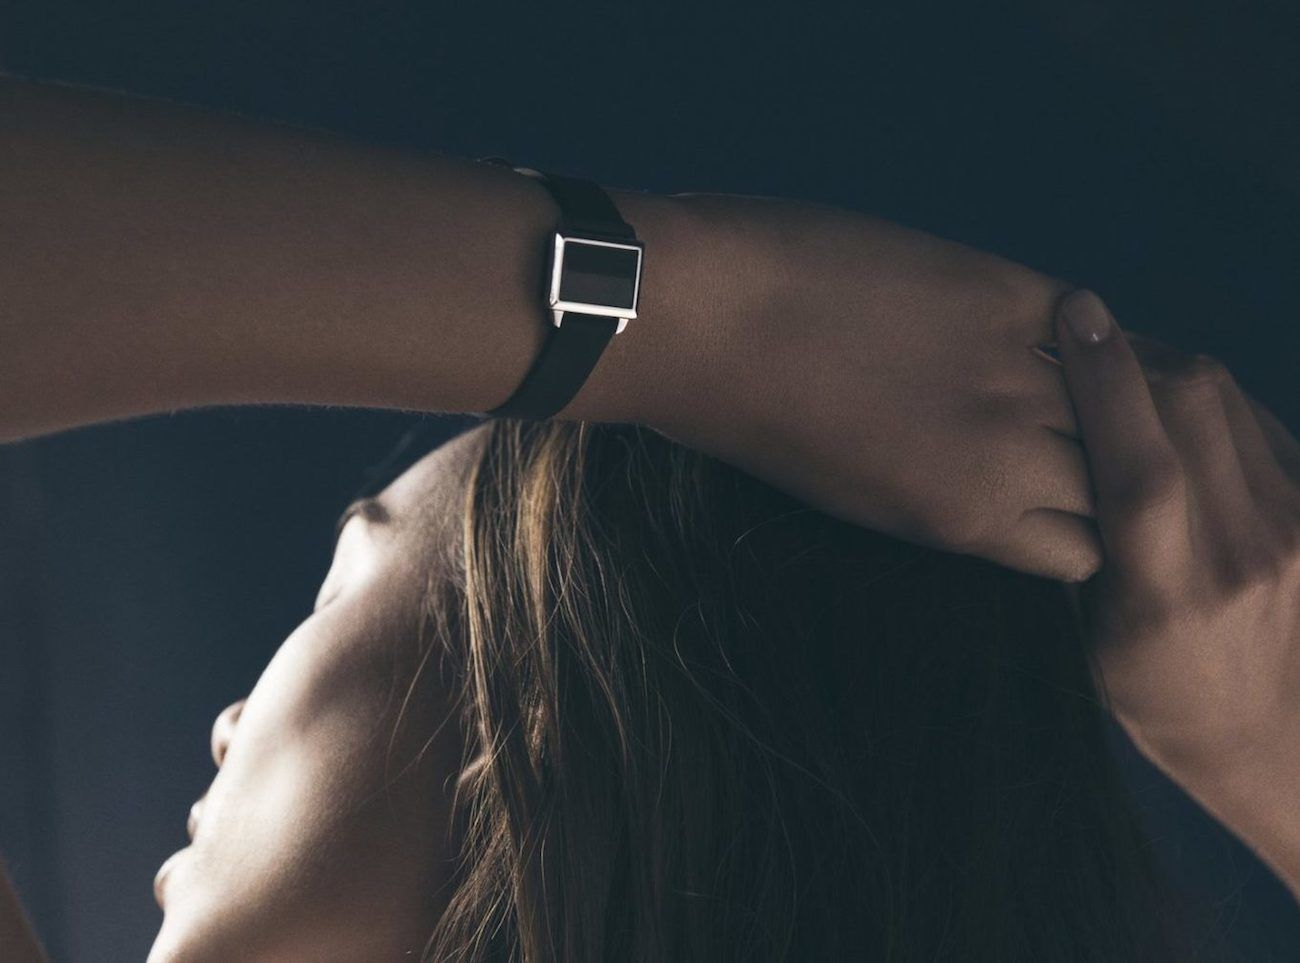 ALTRUIS X Smart Notification Bracelet